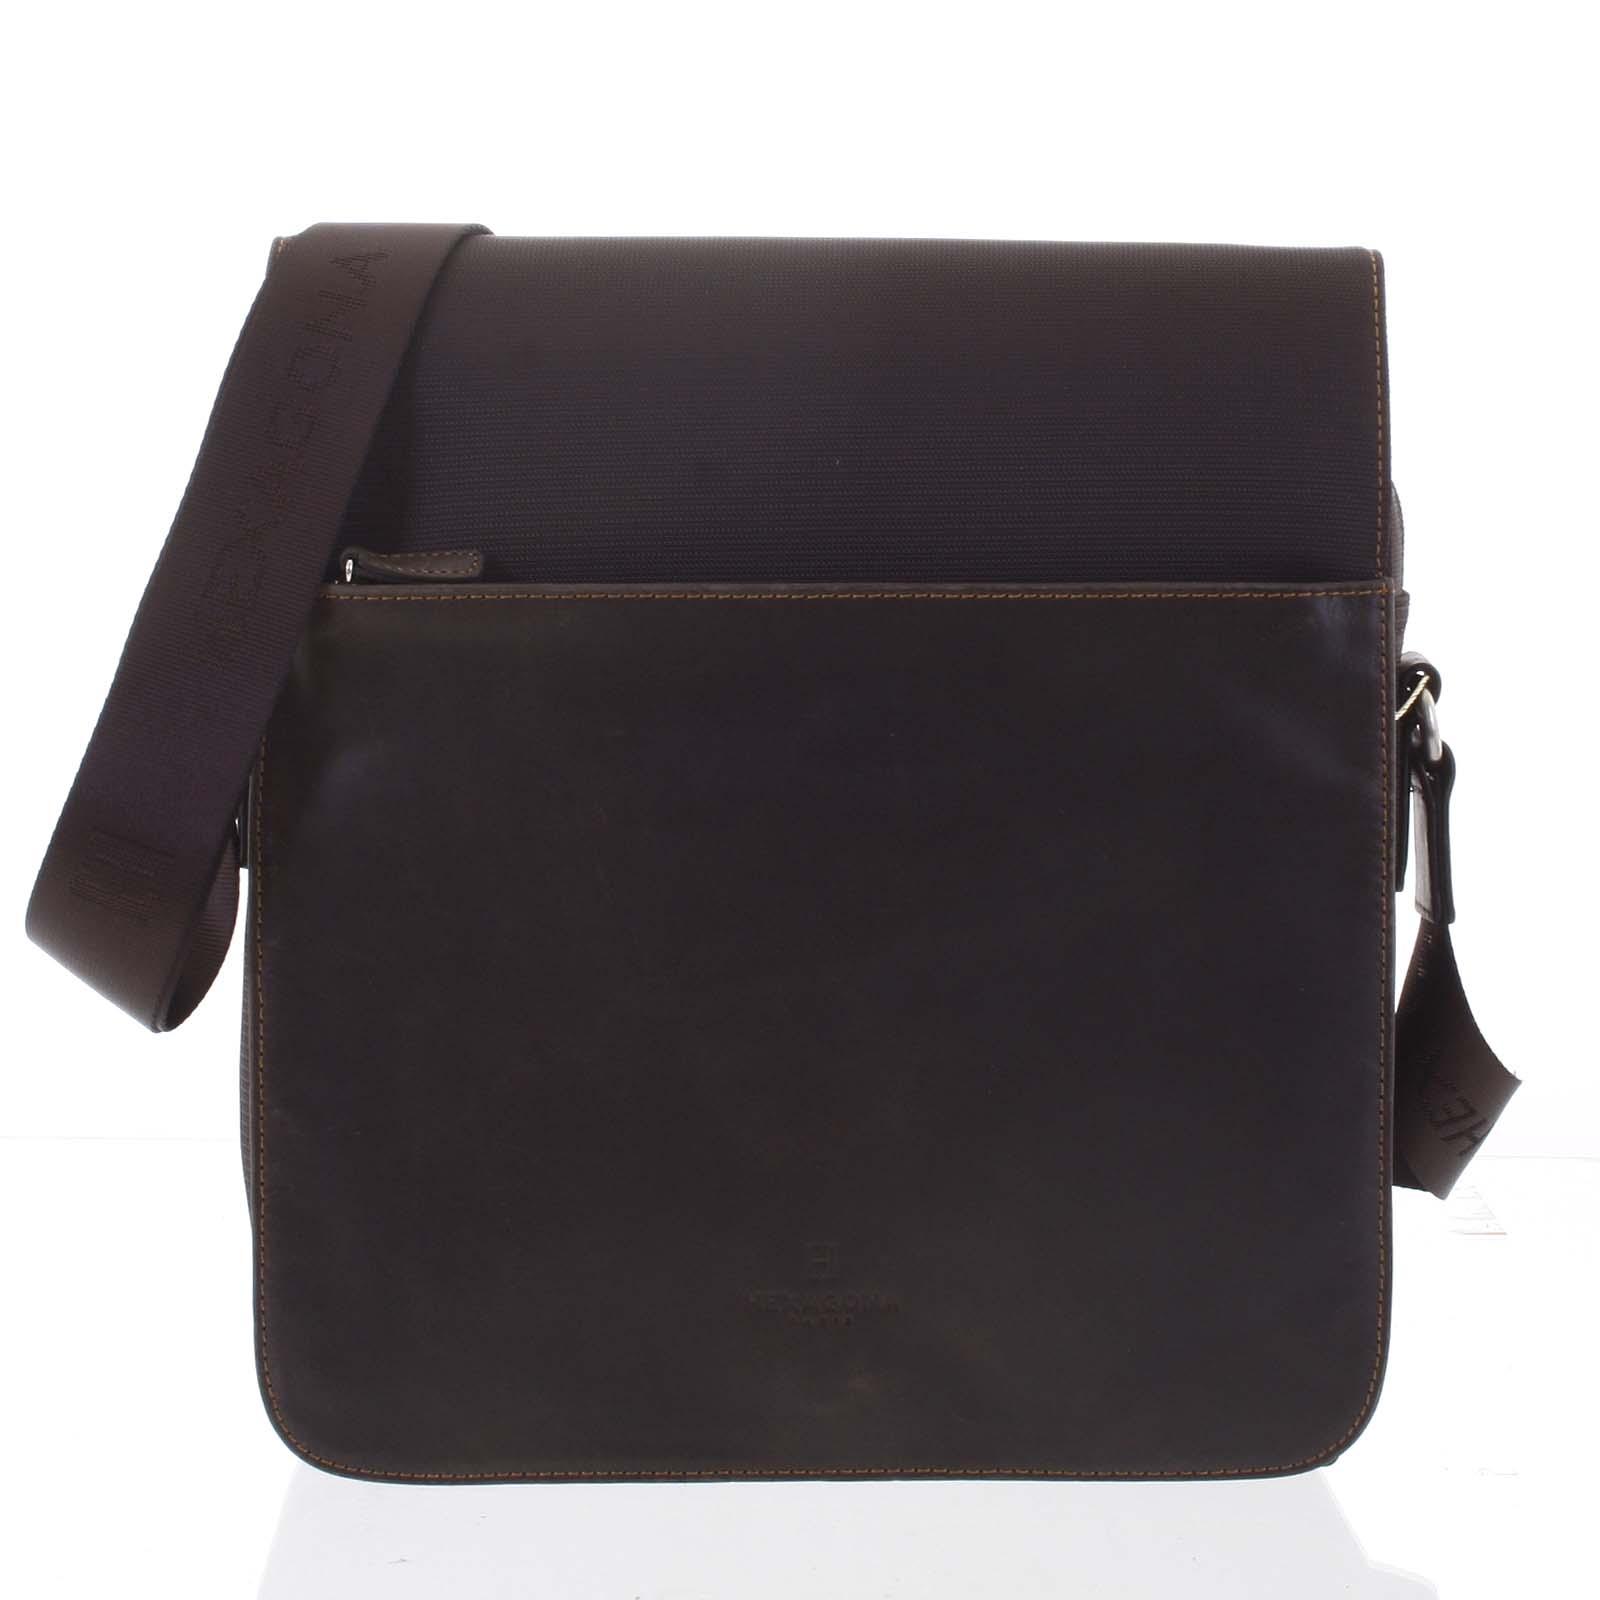 Moderní polokožená kožená taška hnědá - Hexagona Cendrik